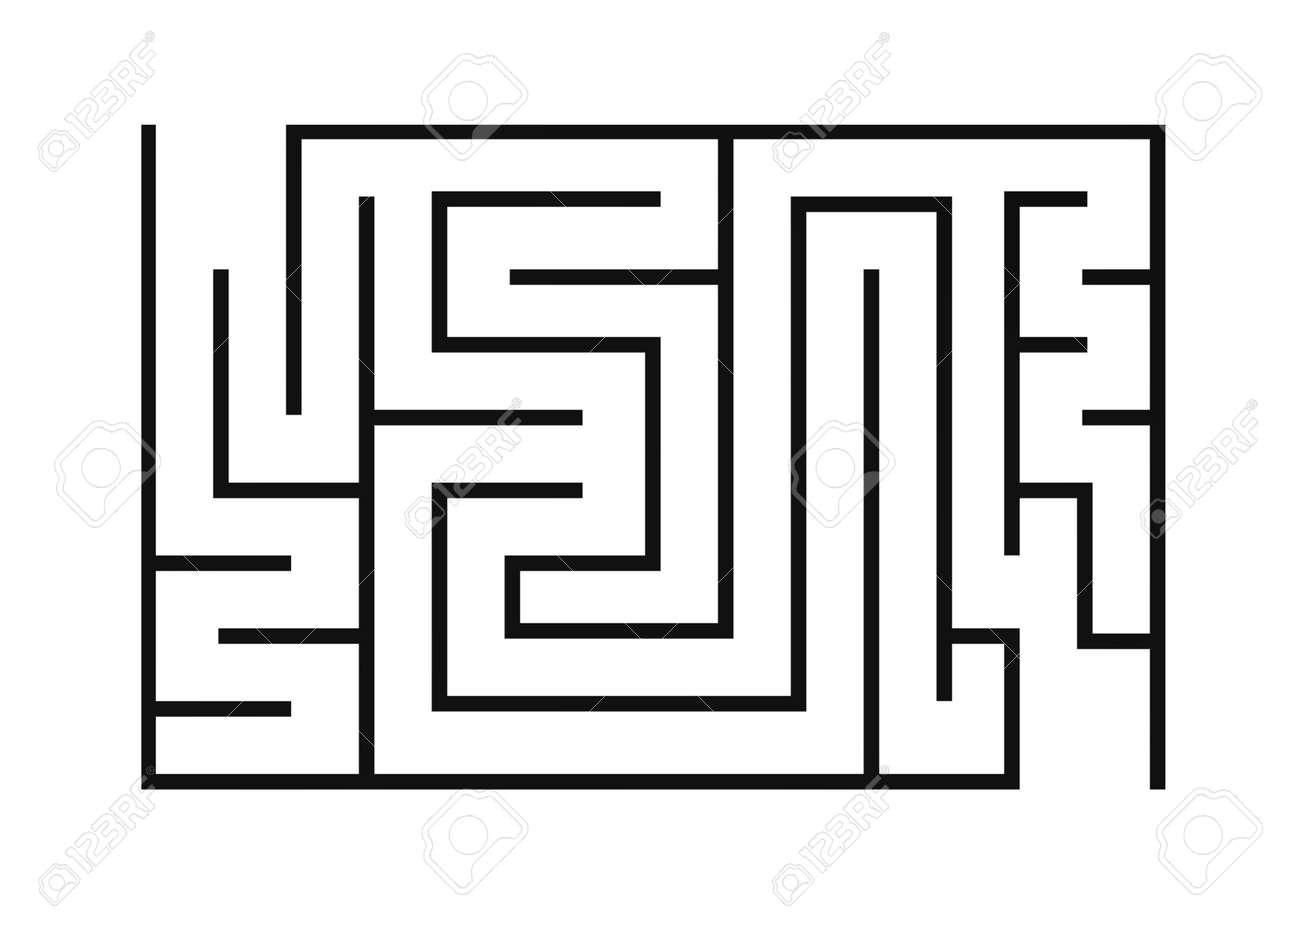 Mole Maze -ThinkMaze.com – Beautiful Mazes on the Web!